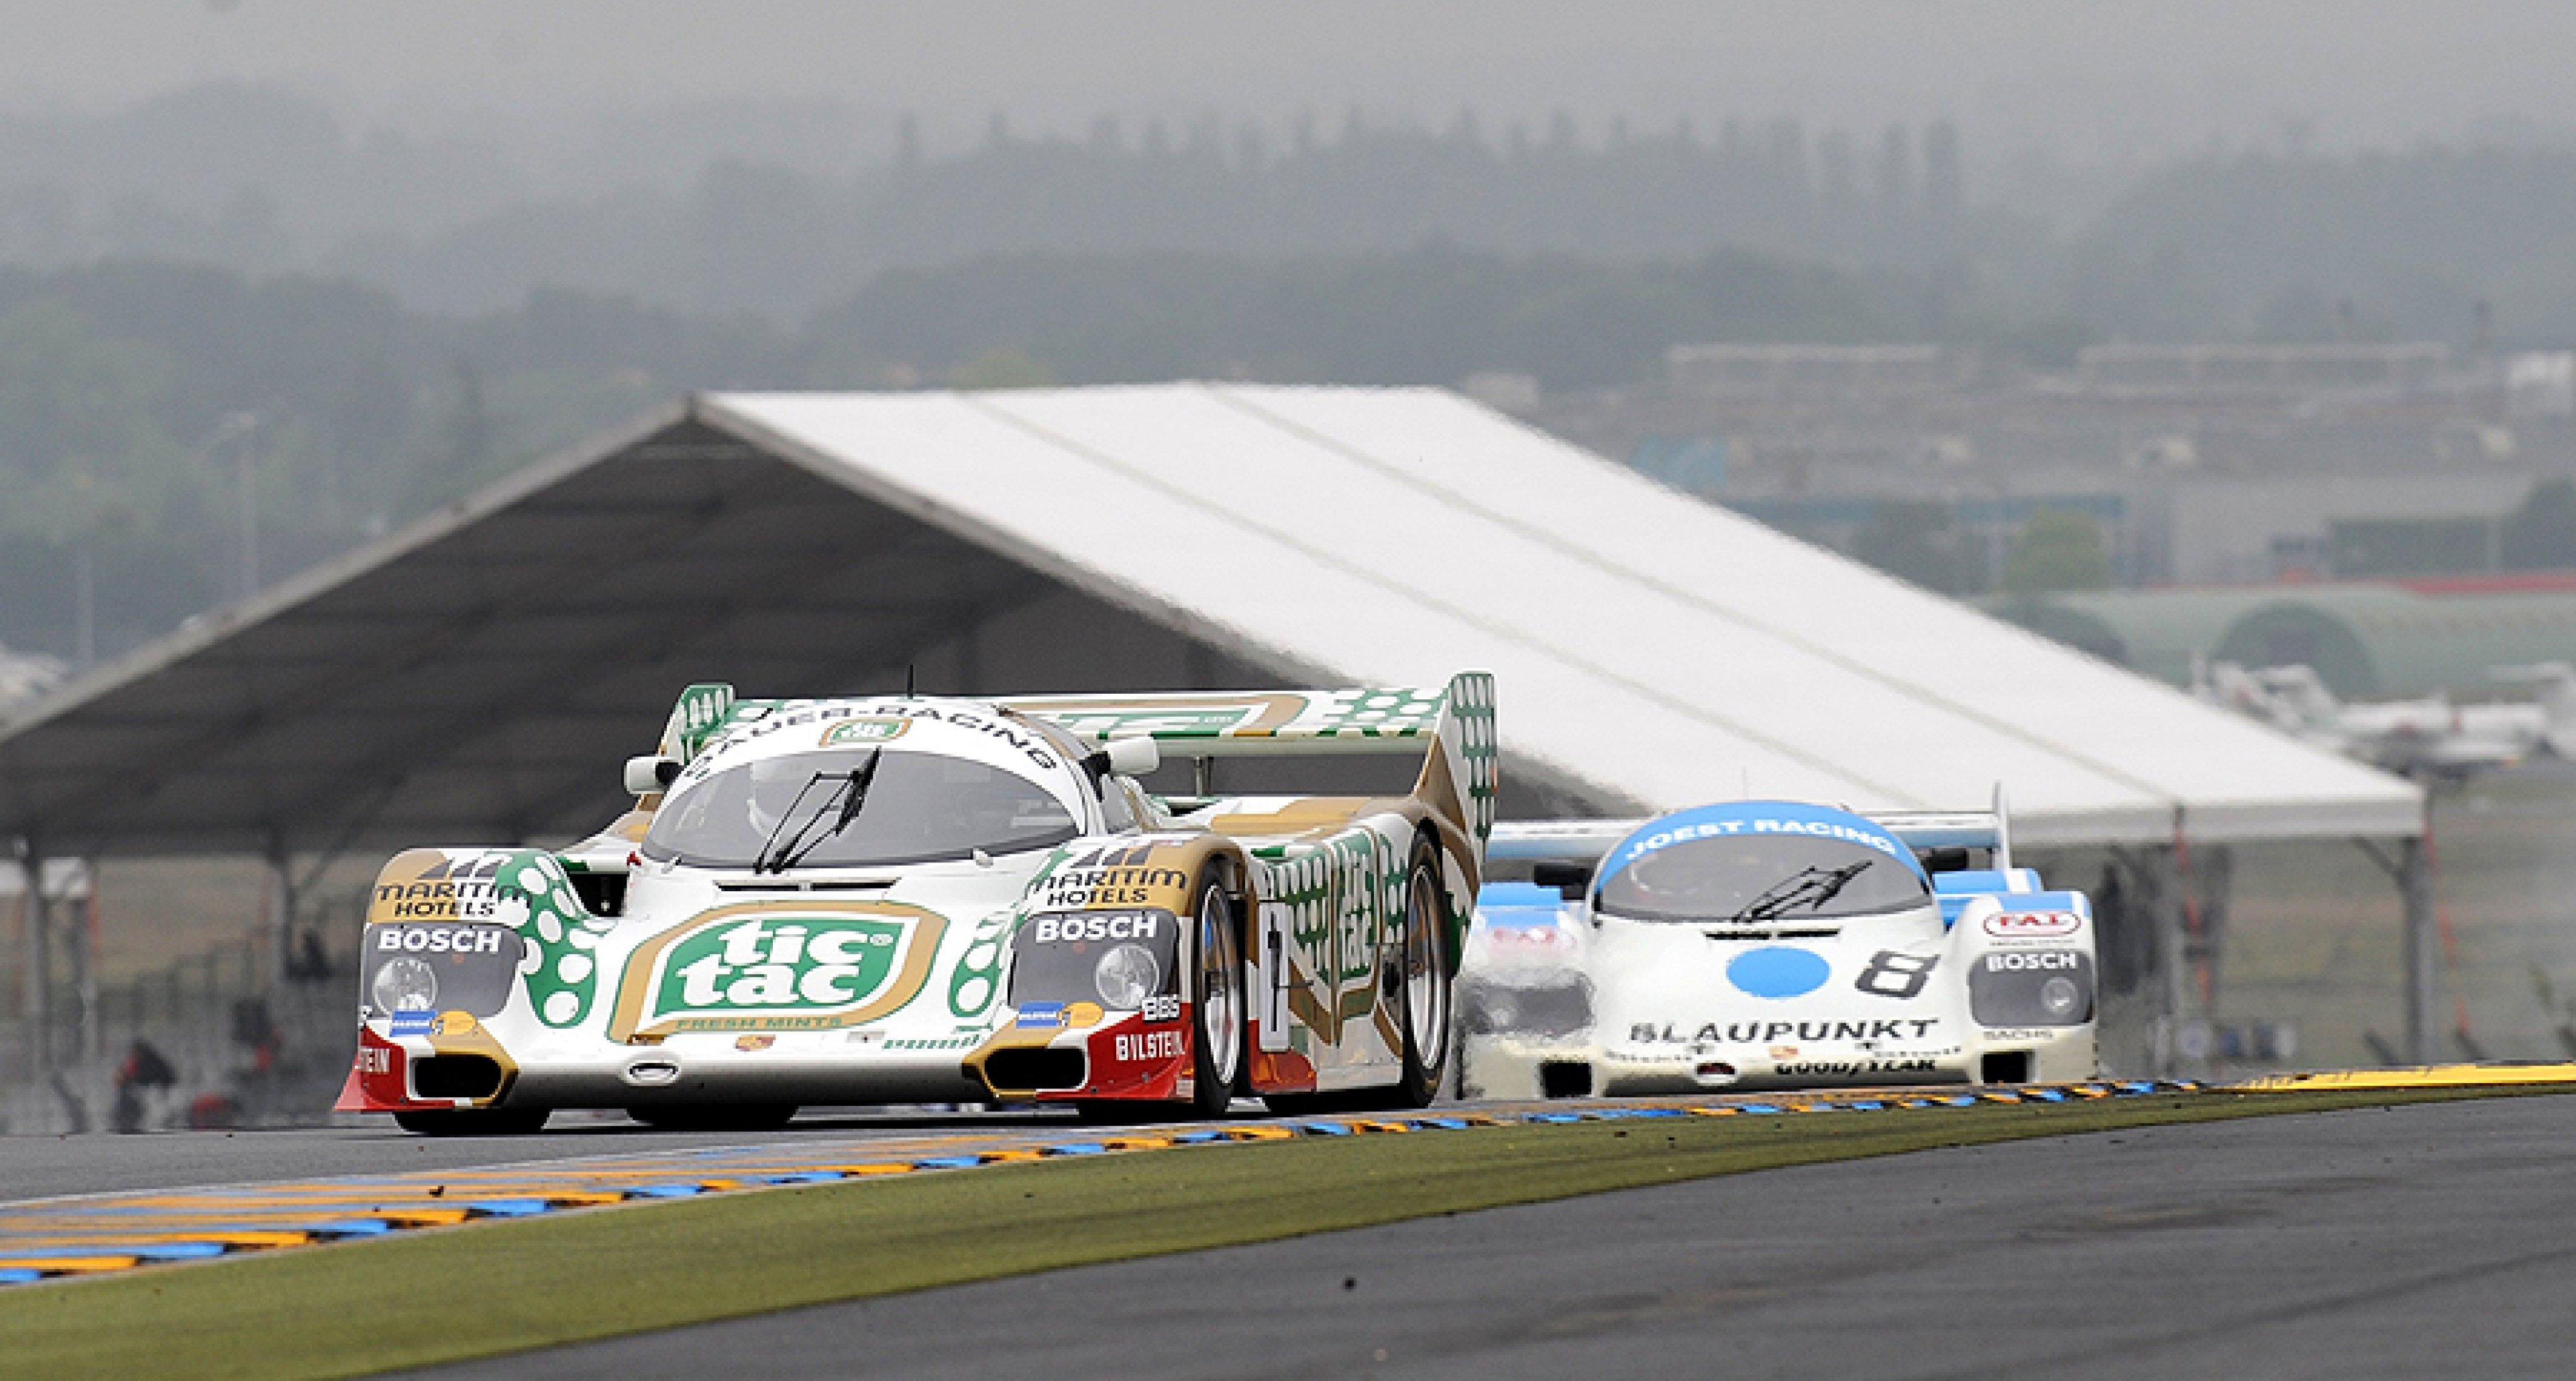 Le Mans 2012: Group C is back